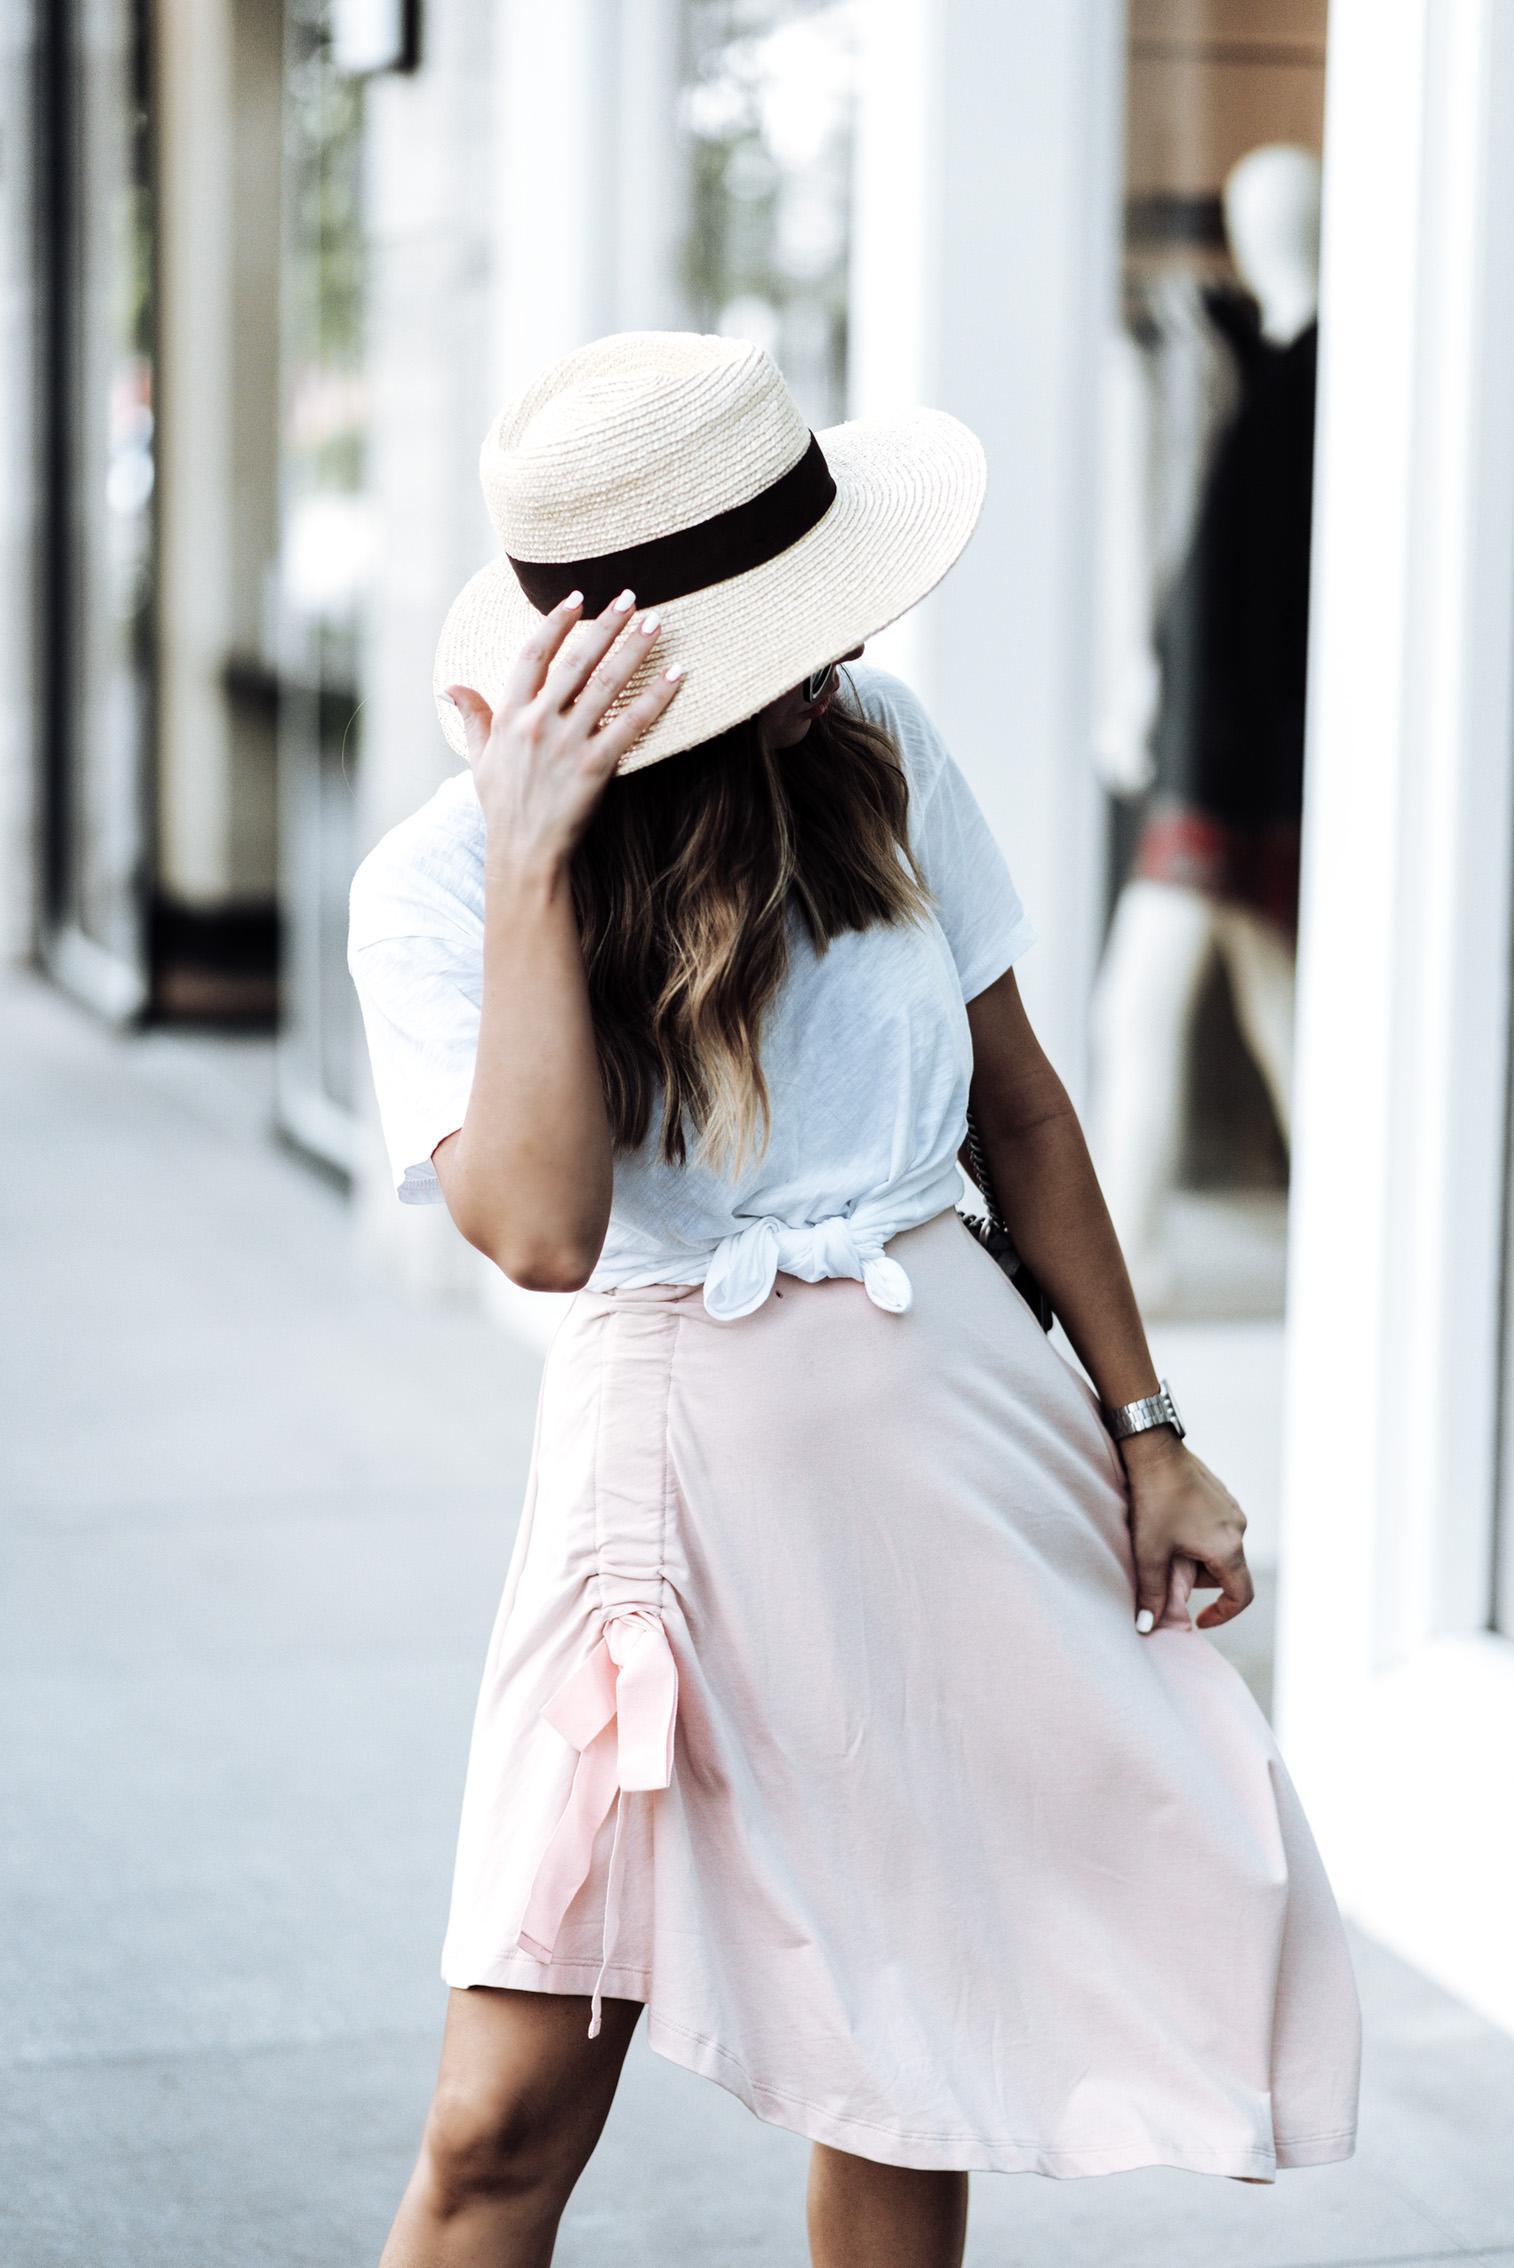 Tiffany Jais Houston fashion and lifestyle blogger   ASOS pink skirt   Cotton crew neck tee   {C/O} Greats sneakers   Gucci Dionysus Bag   Brixton Willow hat   {C/O} Mini Marie Pendant  Streetsyle blogger